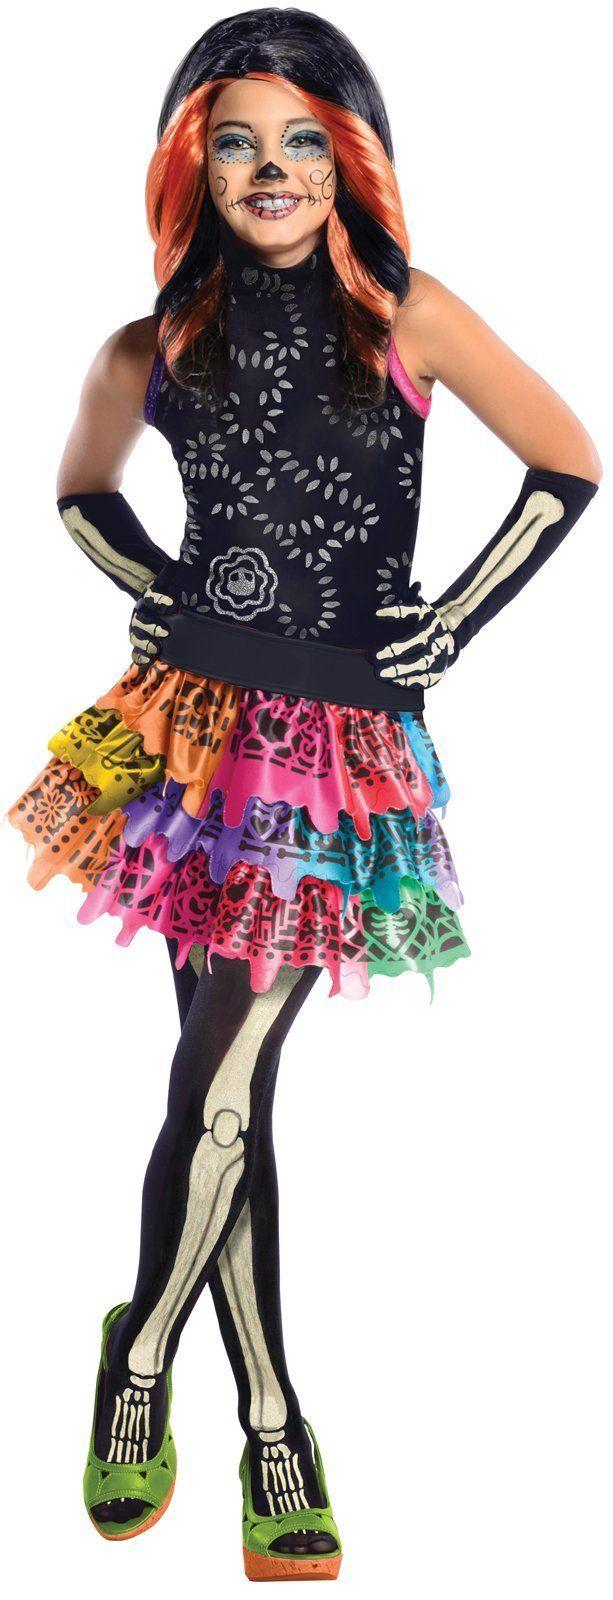 Halloween is coming!  Monster High Skel...  http://reelinthedeal.com/products/monster-high-skelita-calaveras-child-costume?utm_campaign=social_autopilot&utm_source=pin&utm_medium=pin